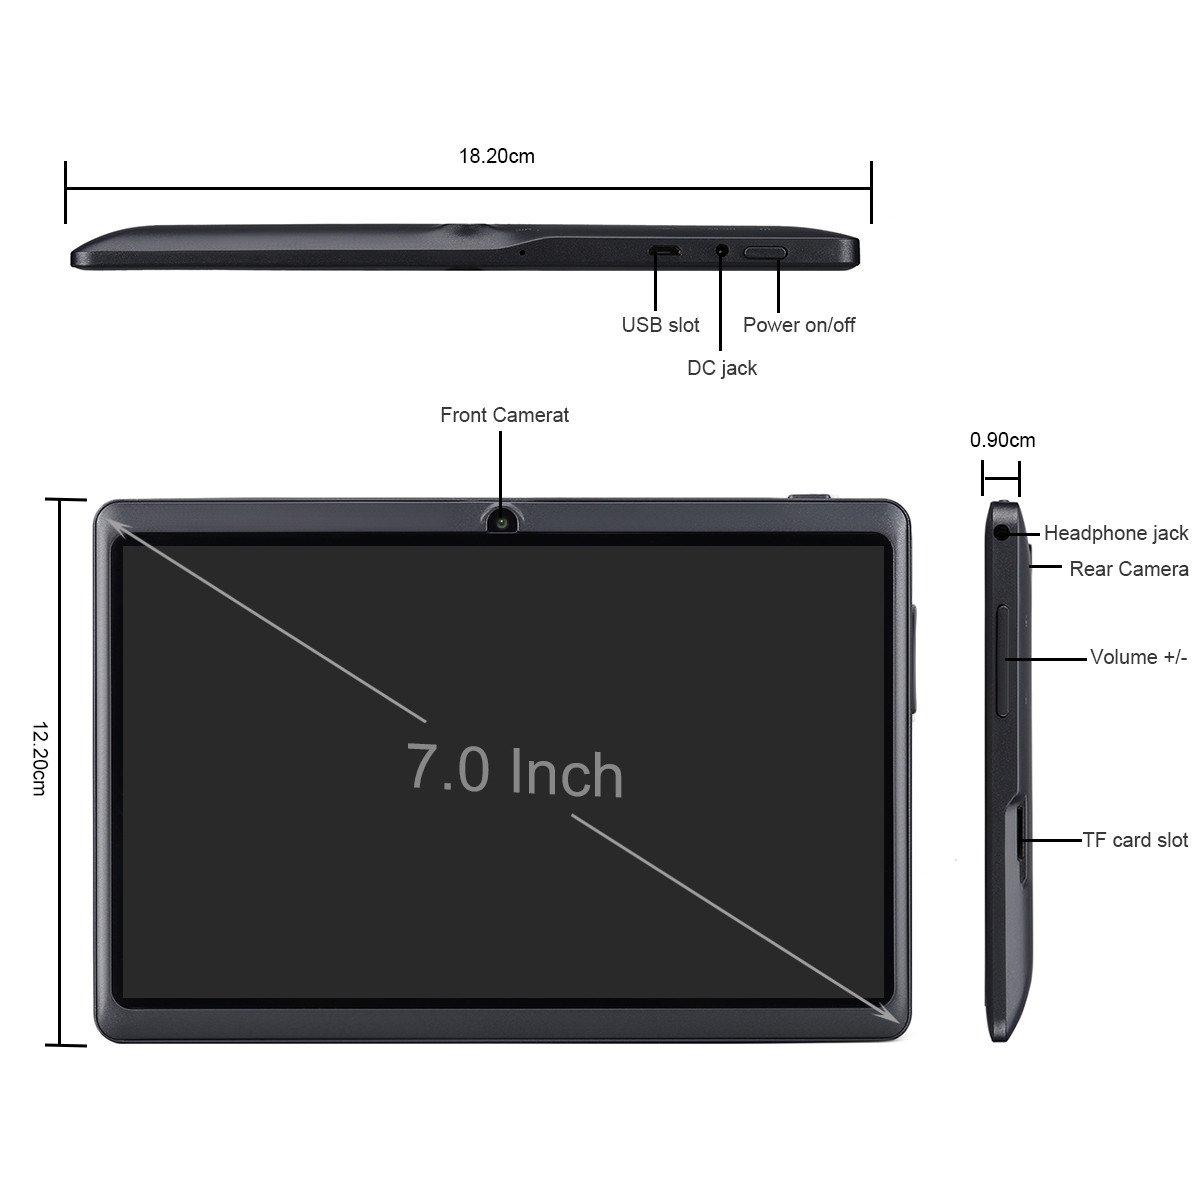 Ainol Q88 Android 7.1 RK3126C Quad Core 1GB+16GB 0.3MP+0.3MP Cam WiFi 2800Ah Tablet PC--Pink by Ainol Q88 (Image #5)